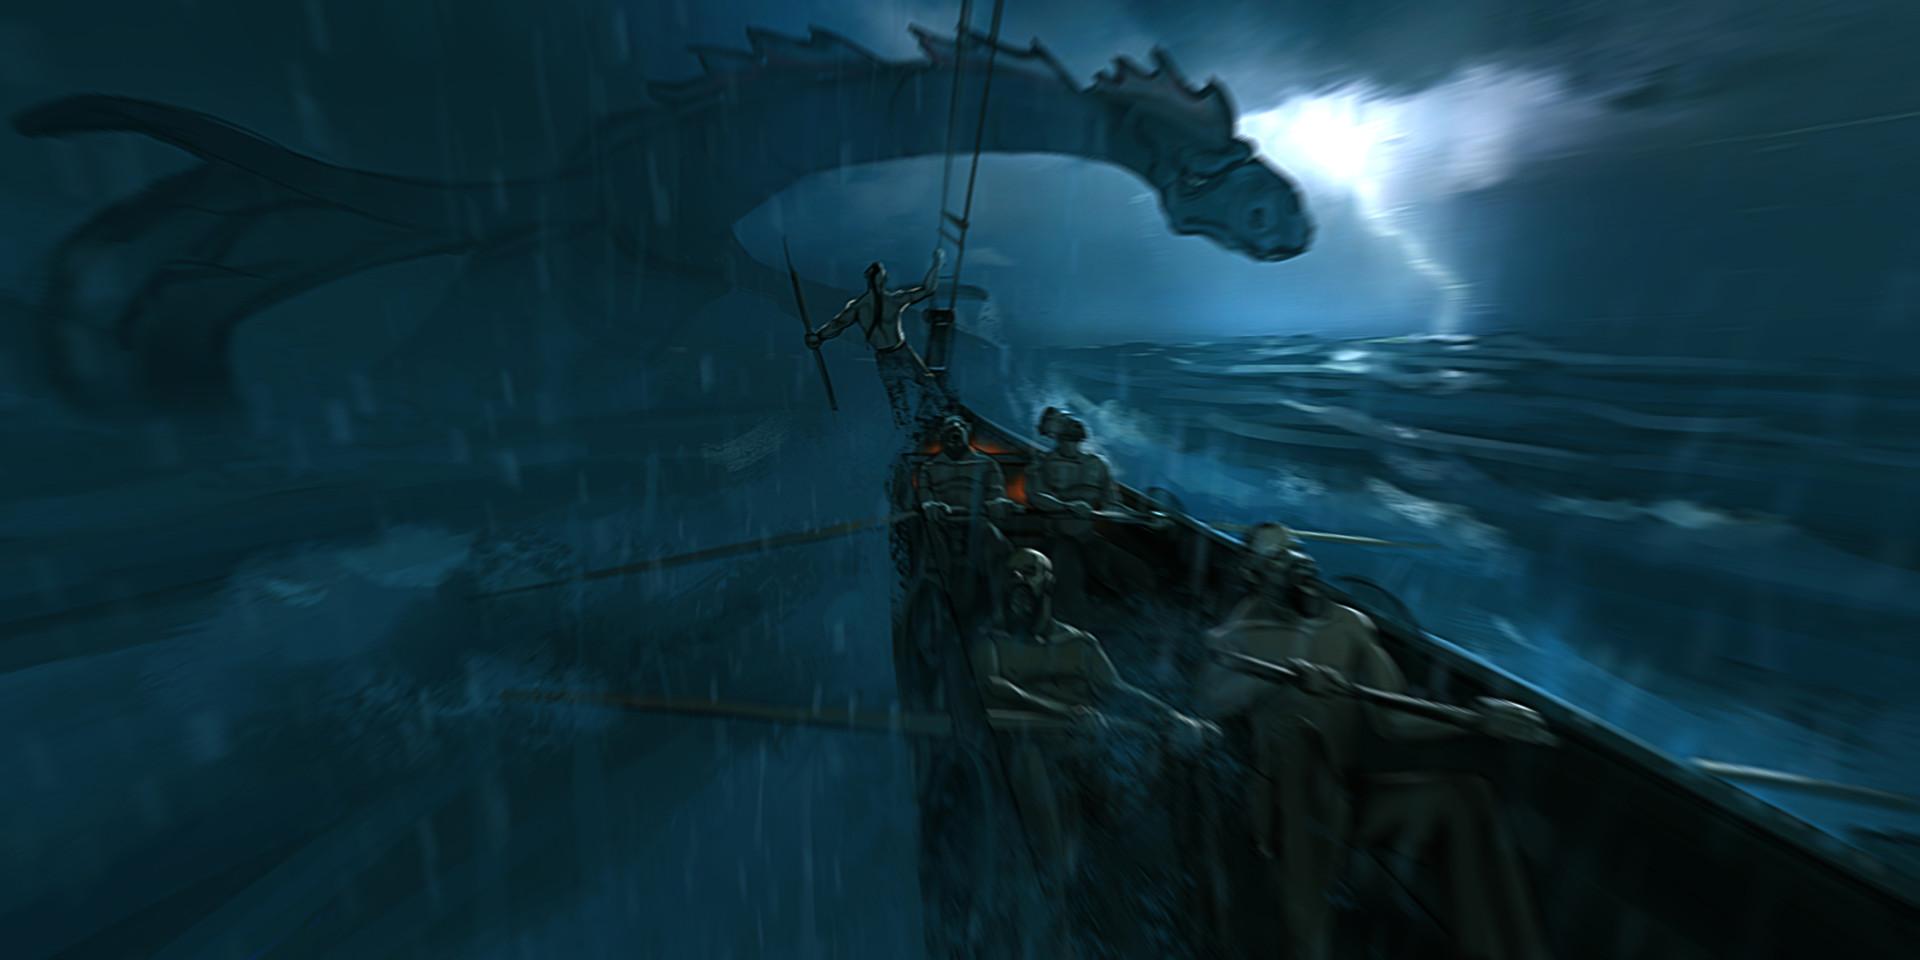 Chirag tripathy viking angle2